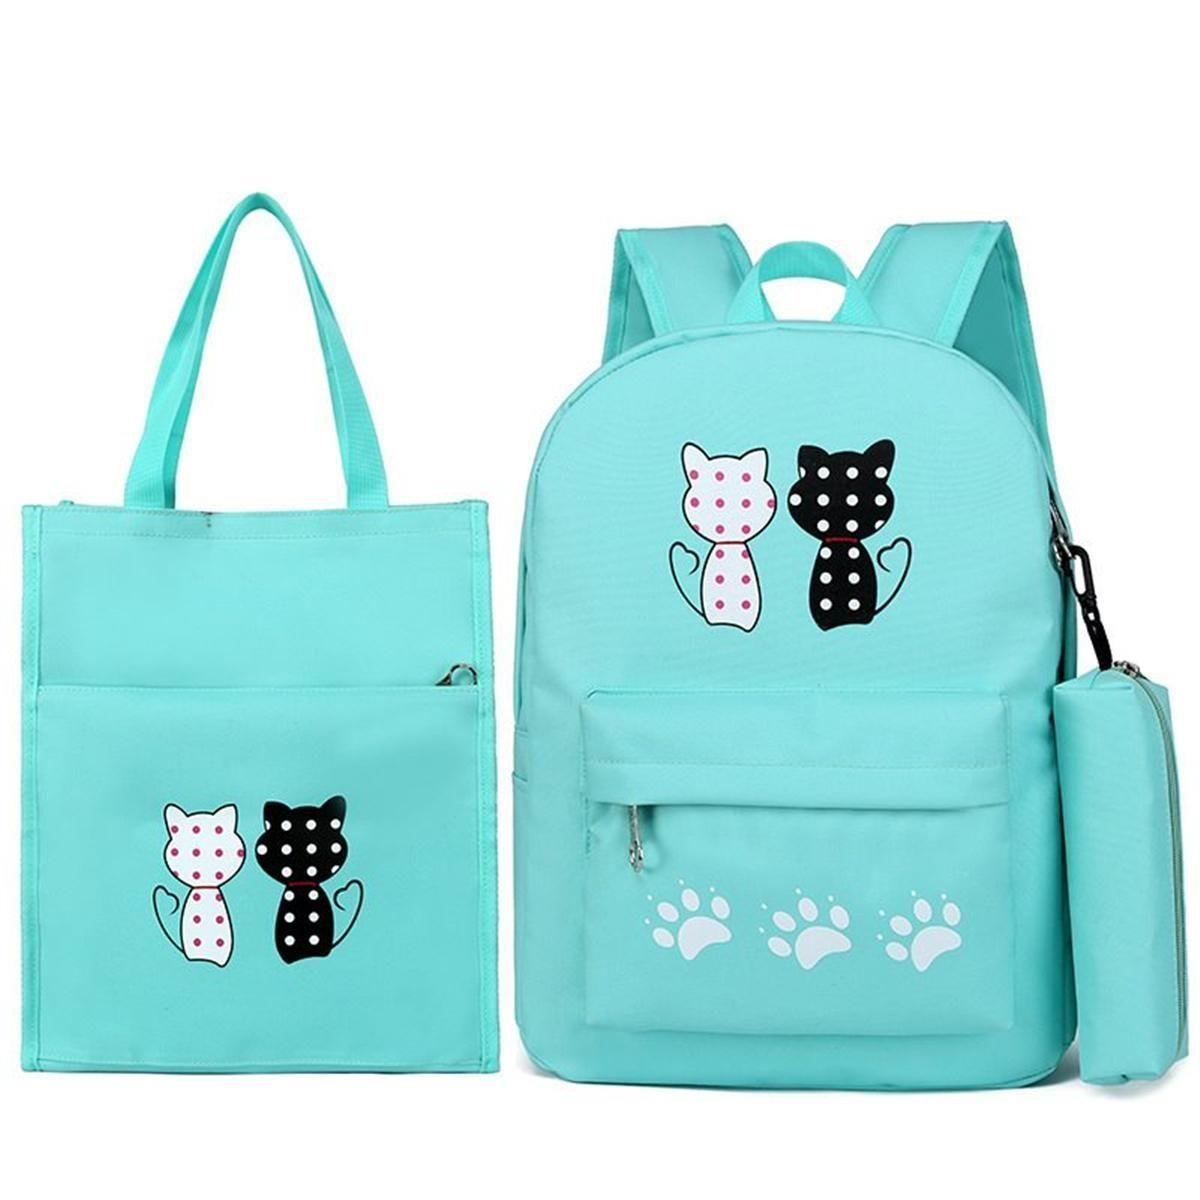 41dafd5427a2 Generic 3 Piece Set Cartoon Cat Student Bag Backpack Backpack